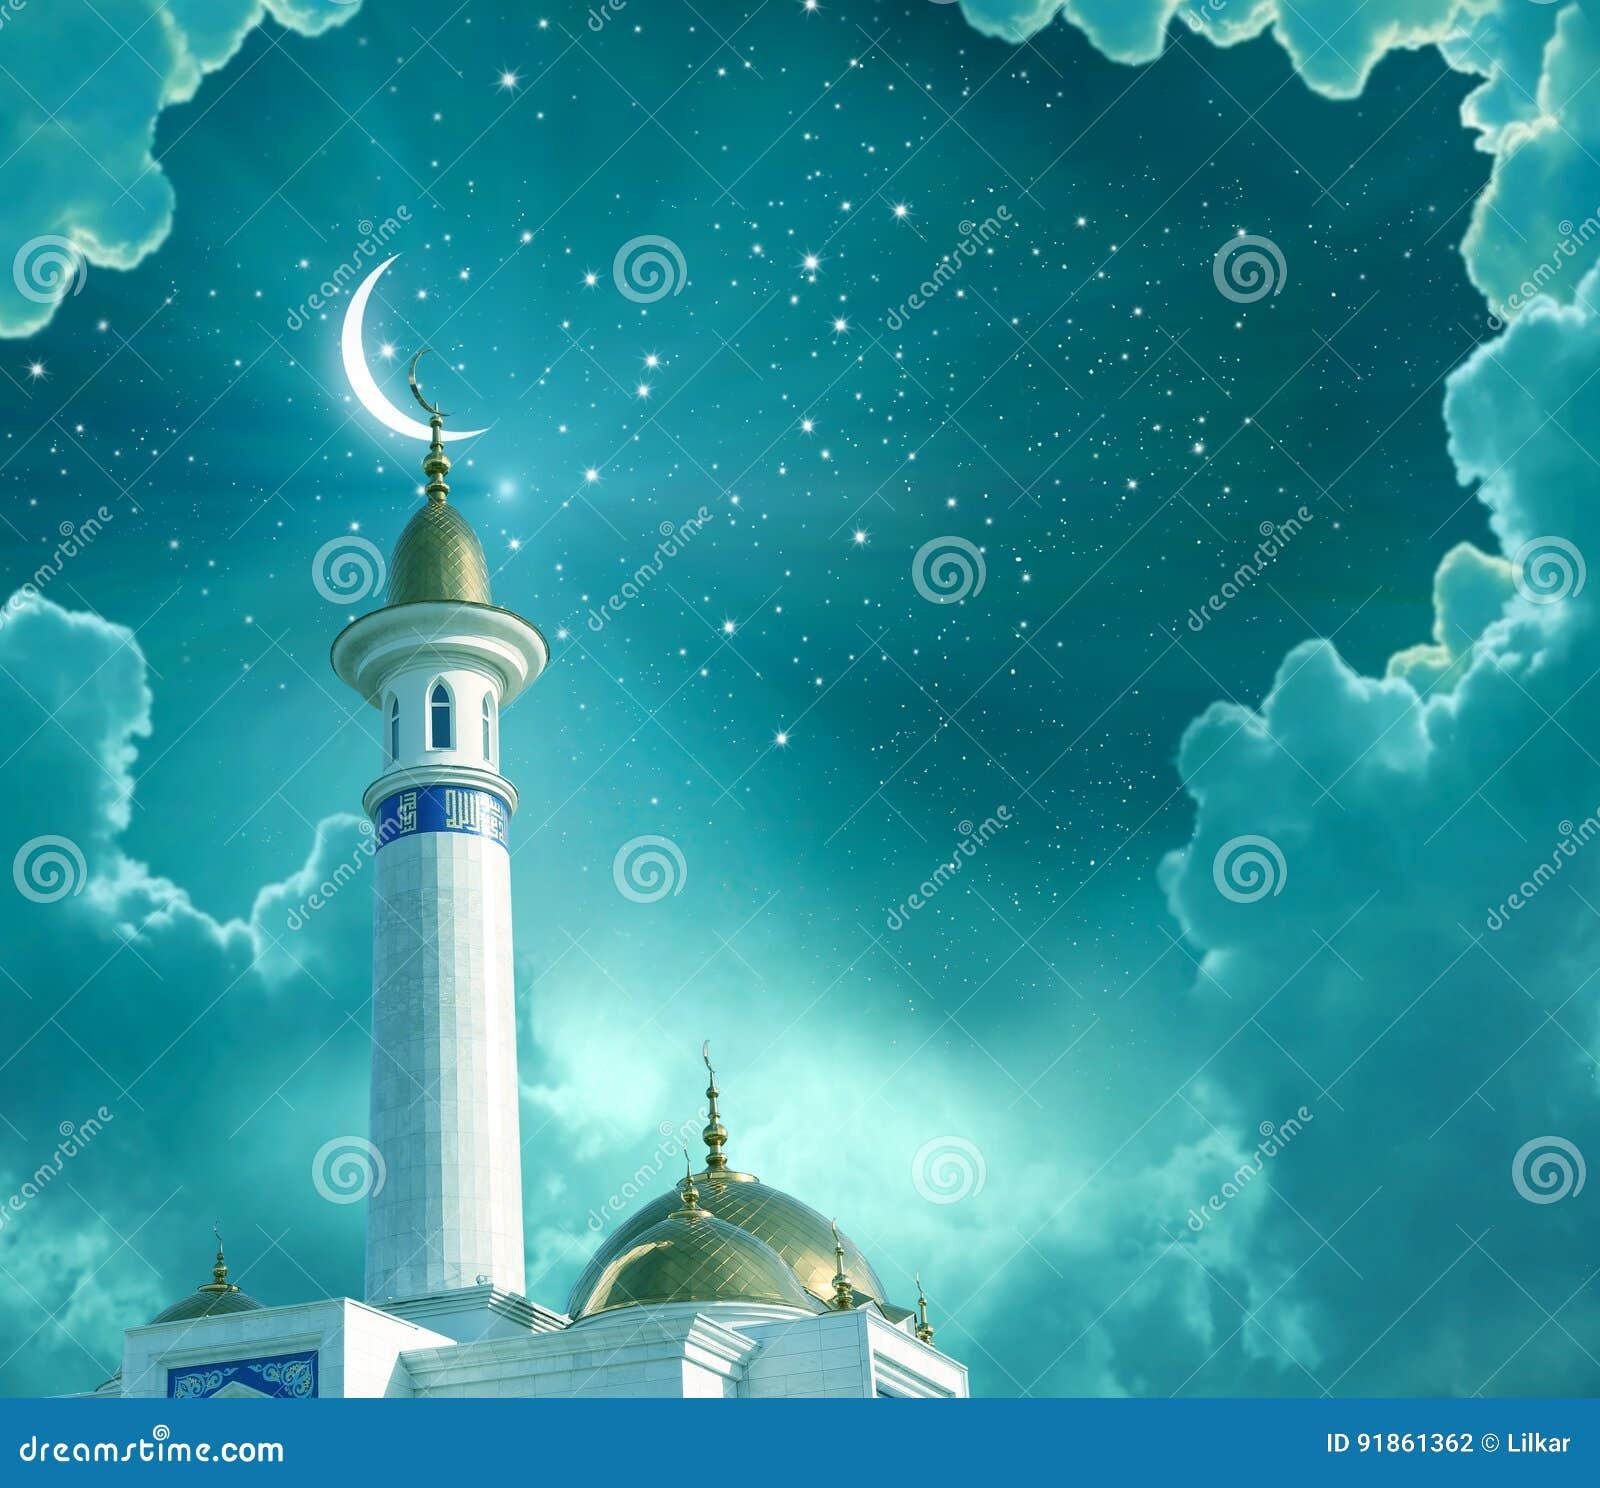 Mosque background for ramadan kareem stock photography image - Crescent Eid Greeting Islamic Kareem Moon Mosque Muslim Ramadan